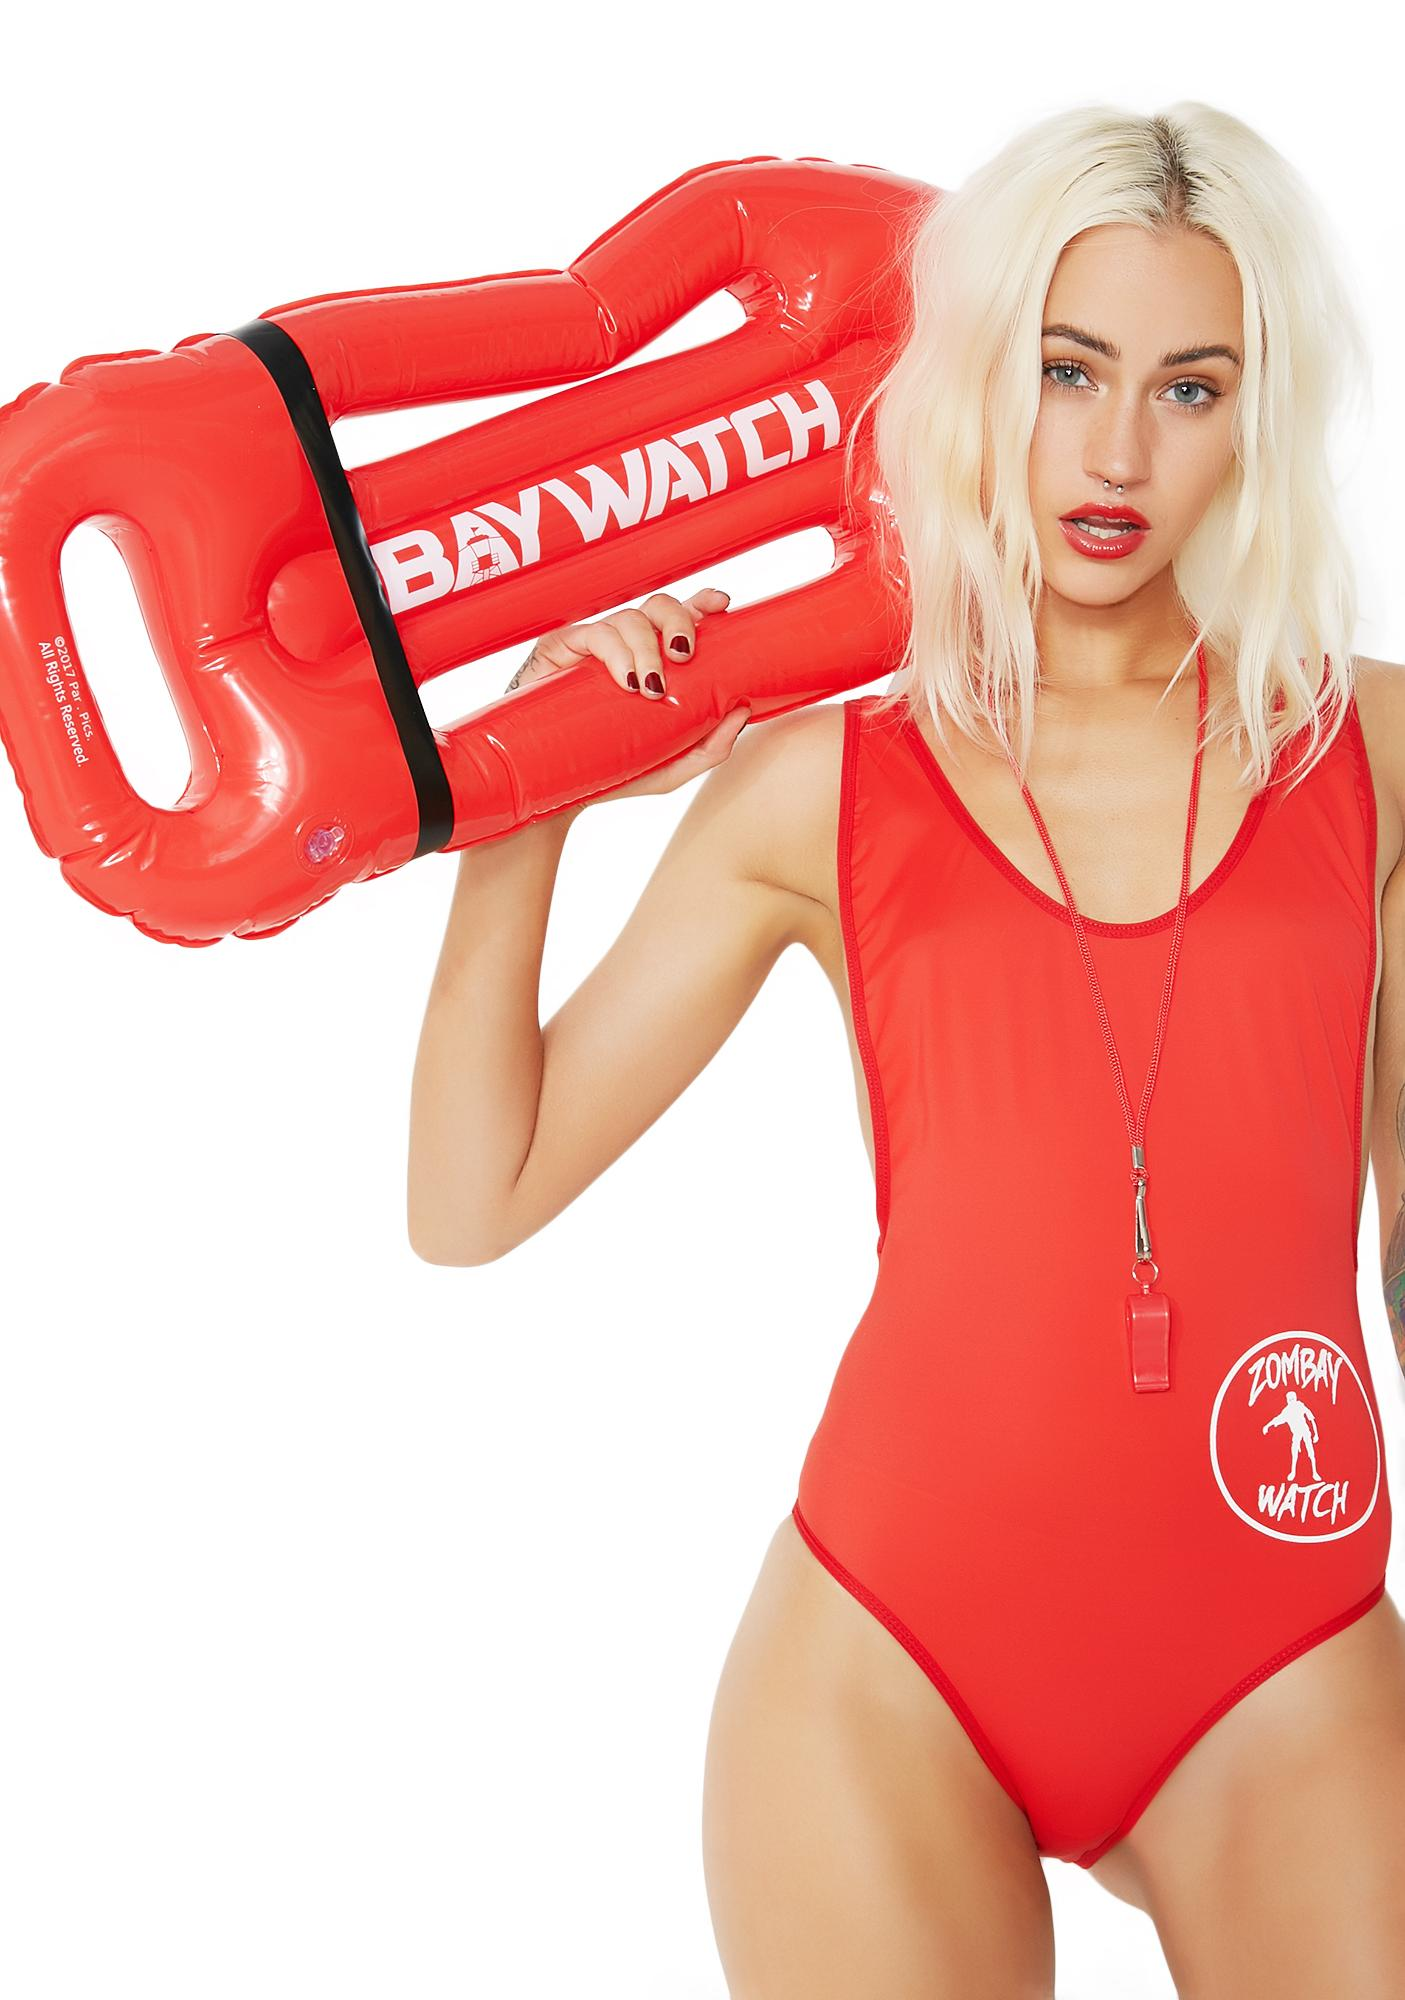 Savin' Lives Inflatable Buoy